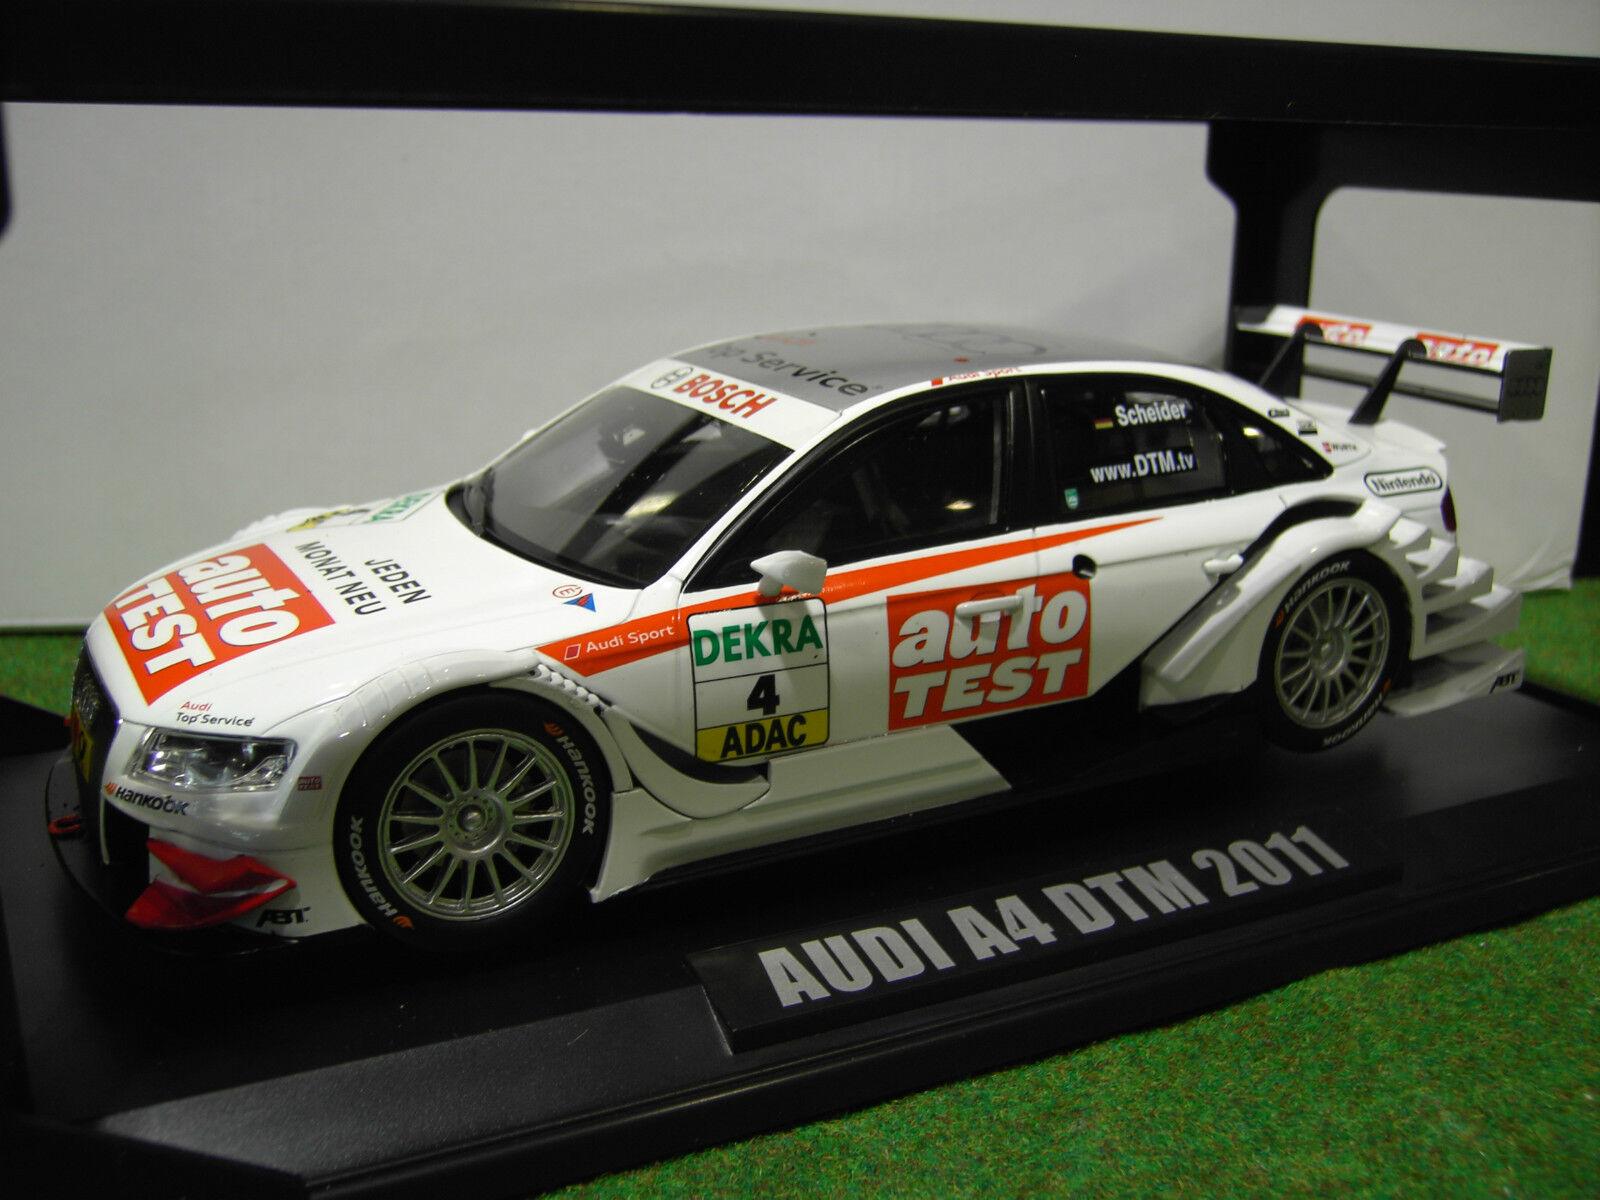 AUDI A4 DTM 2011  4i sport TEAM Scheider 1 18 NOREV 188337 voiture miniature